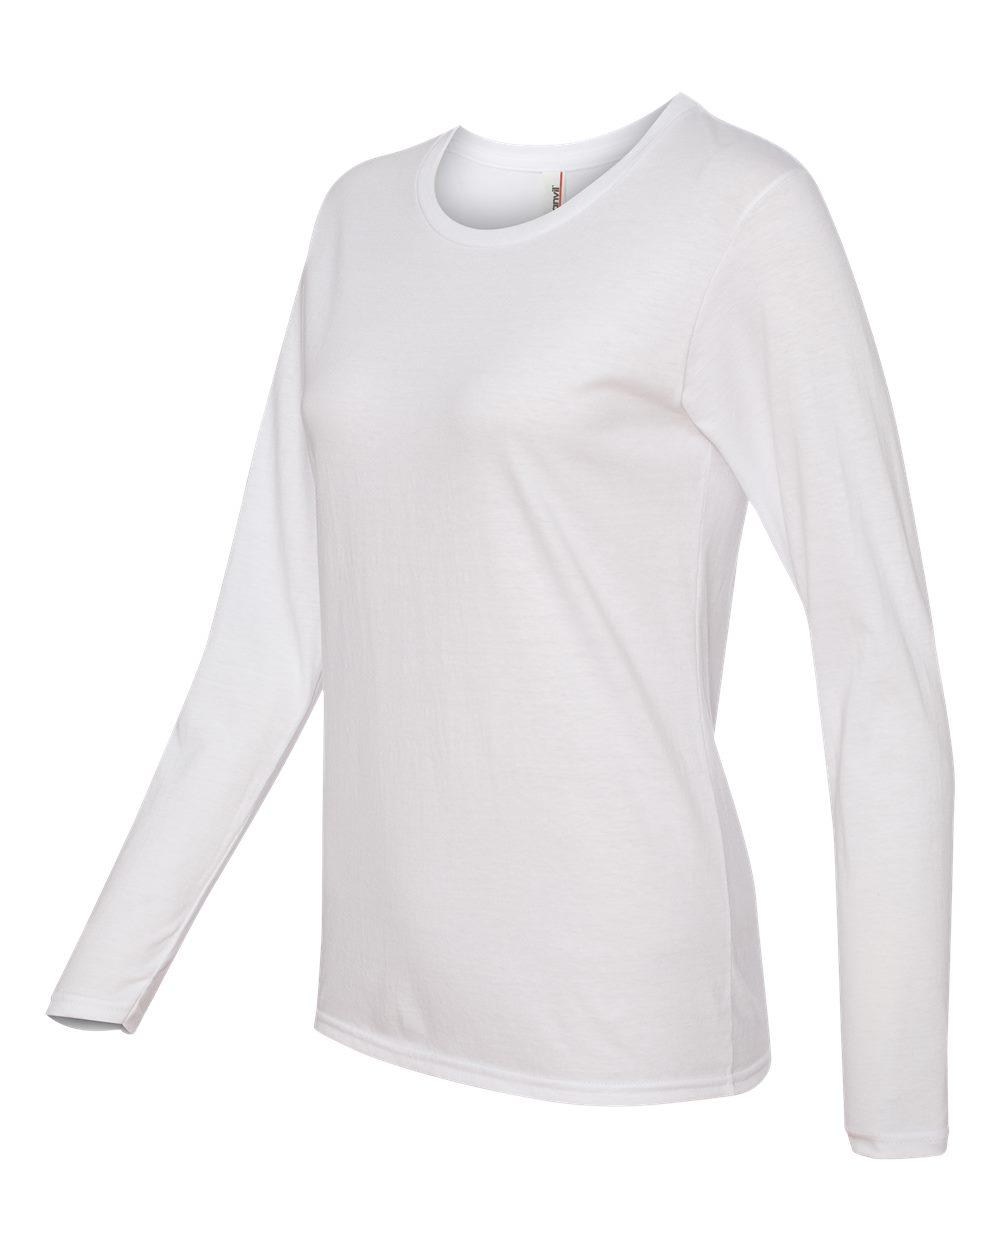 Anvil-Womens-Lightweight-Long-Sleeve-T-Shirt-884L-Size-S-2XL thumbnail 28